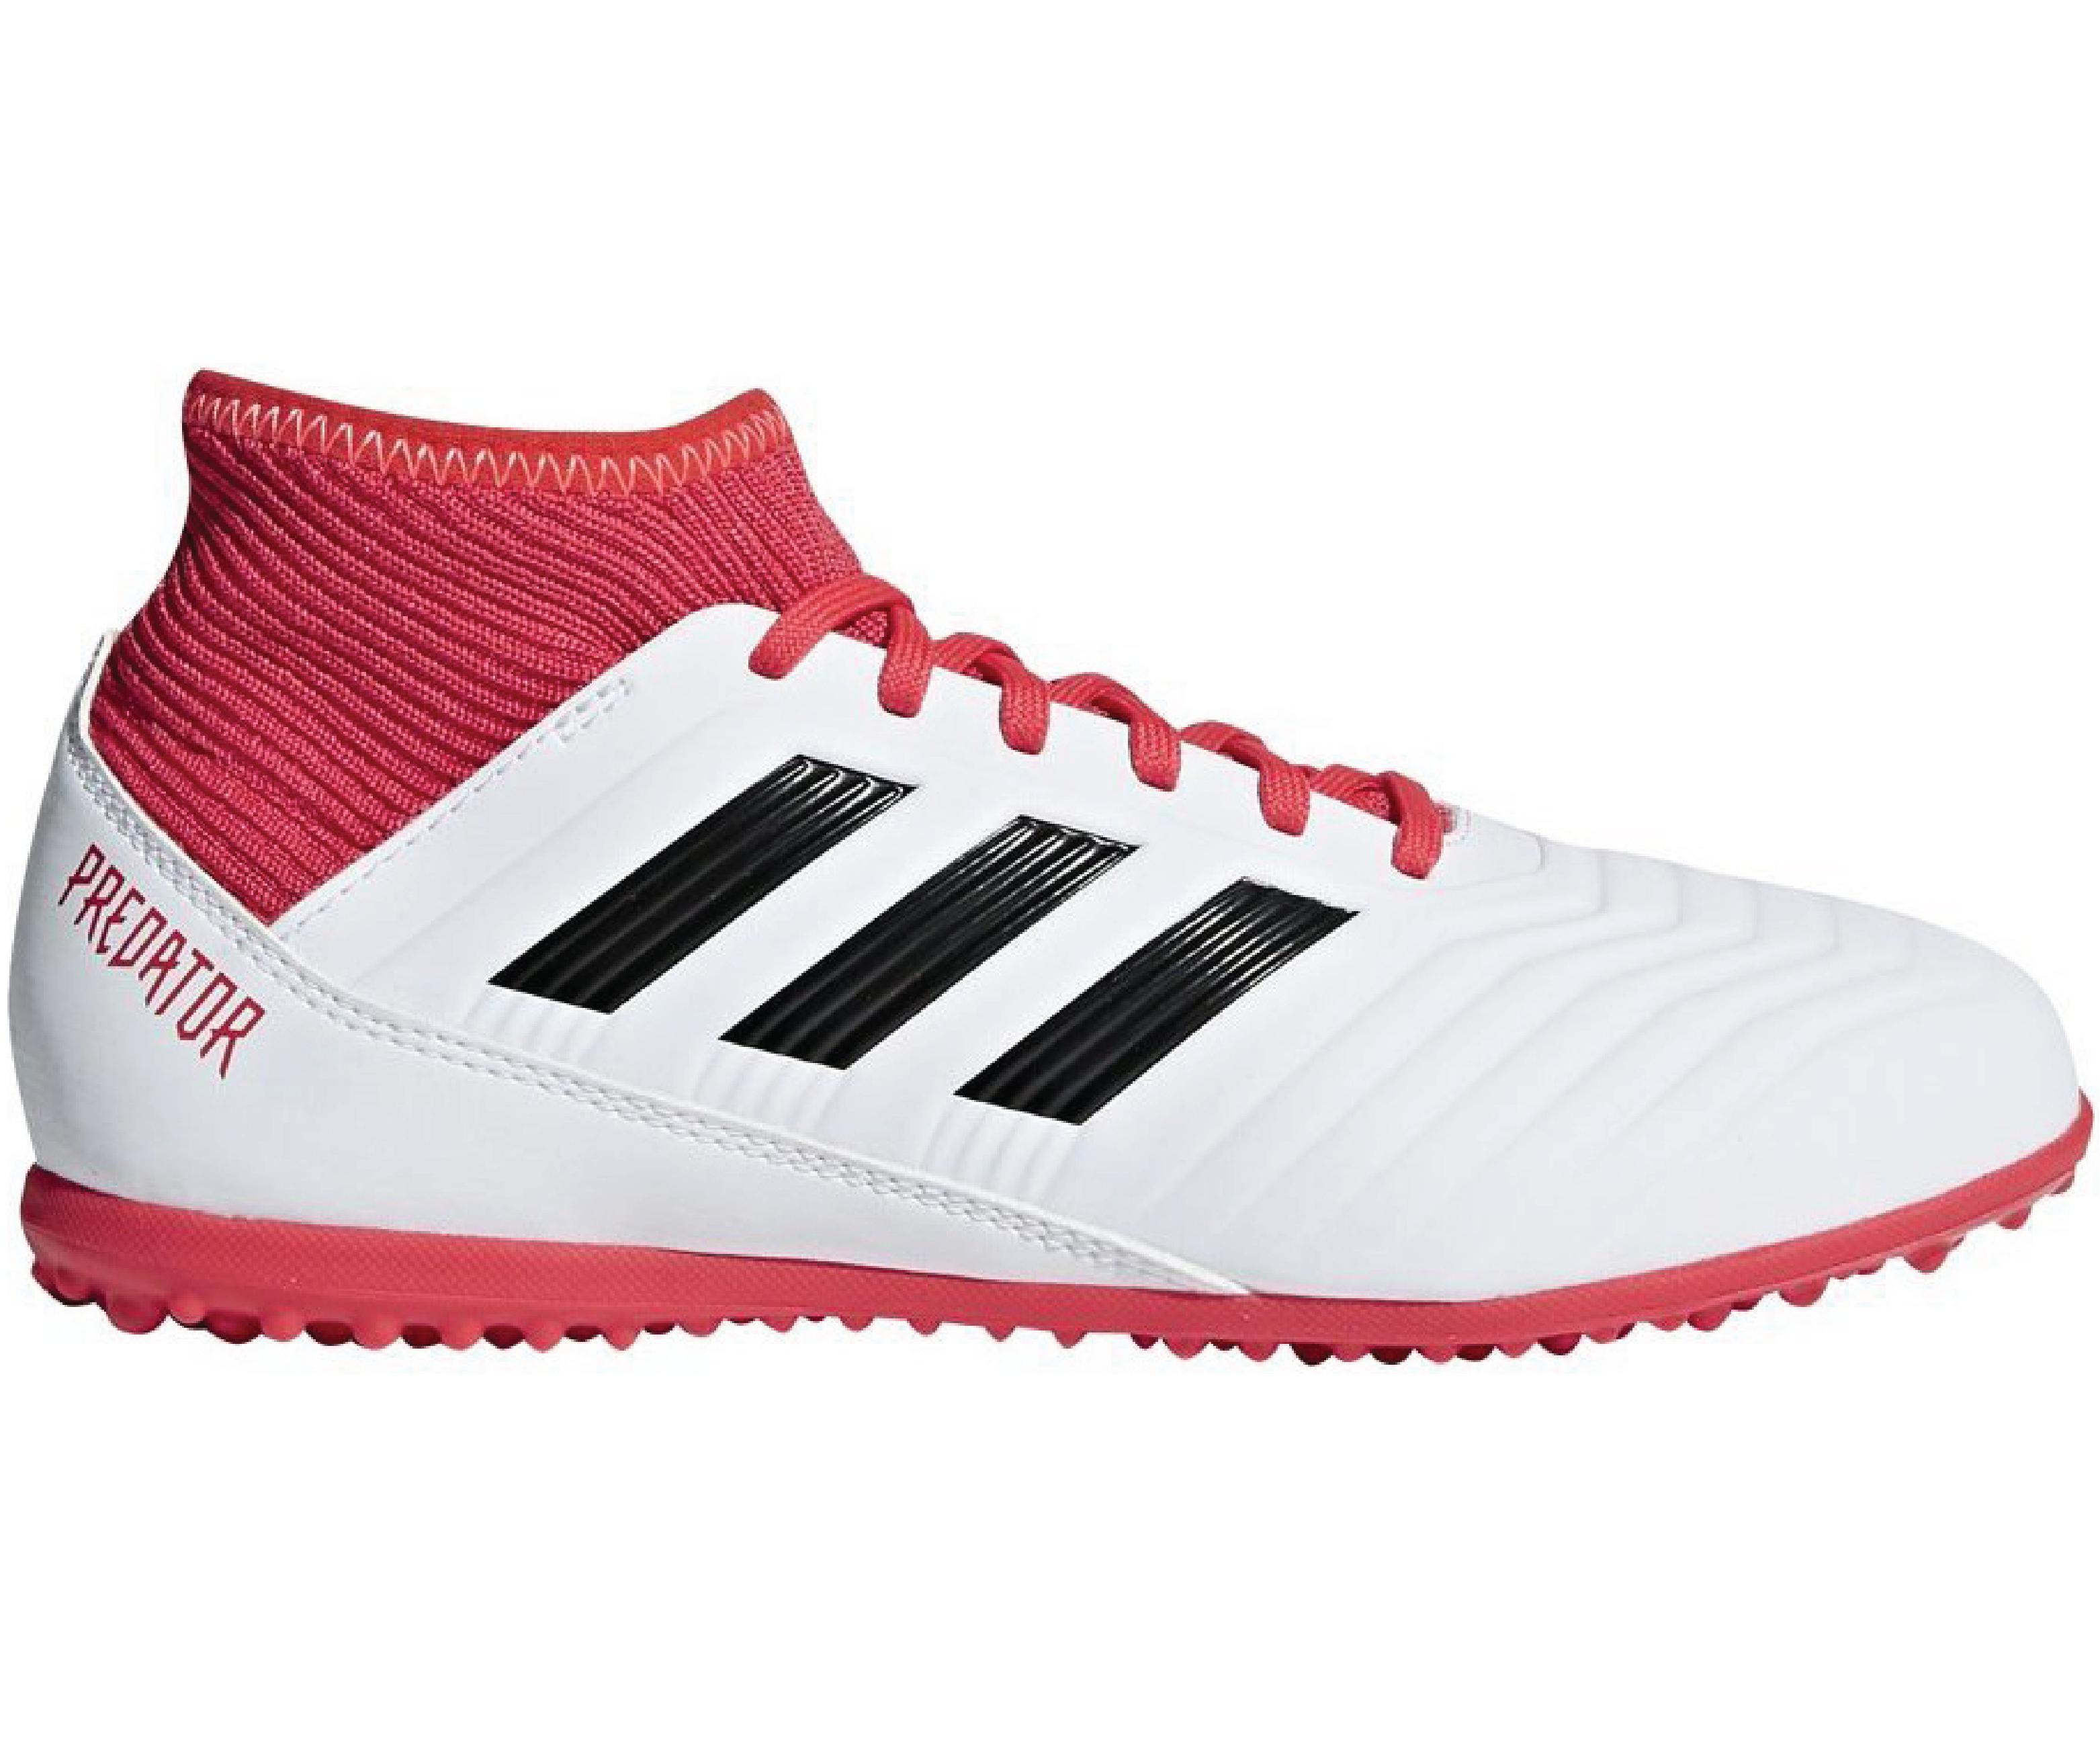 Adidas predator, Soccer